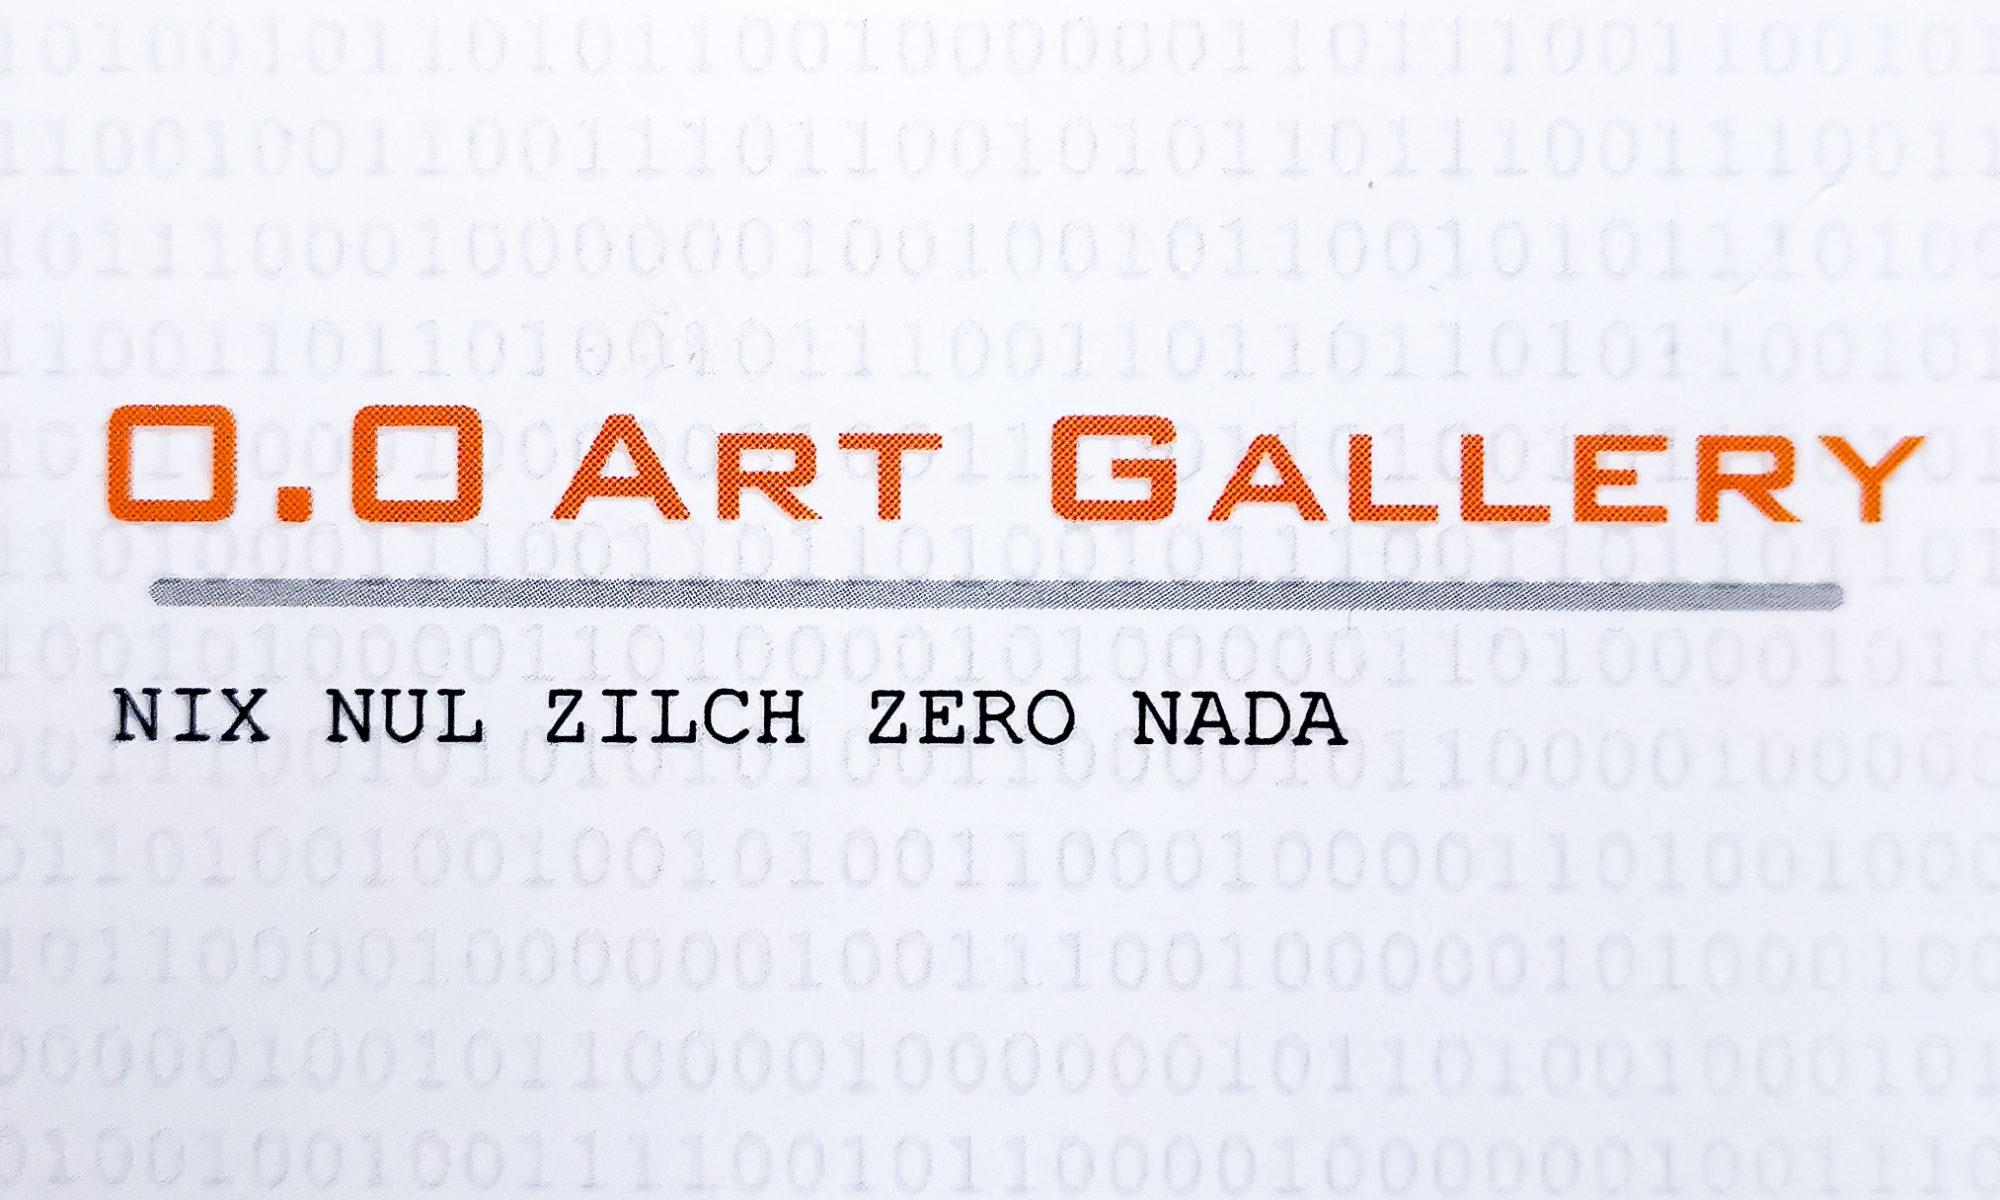 0.0 Art Gallery